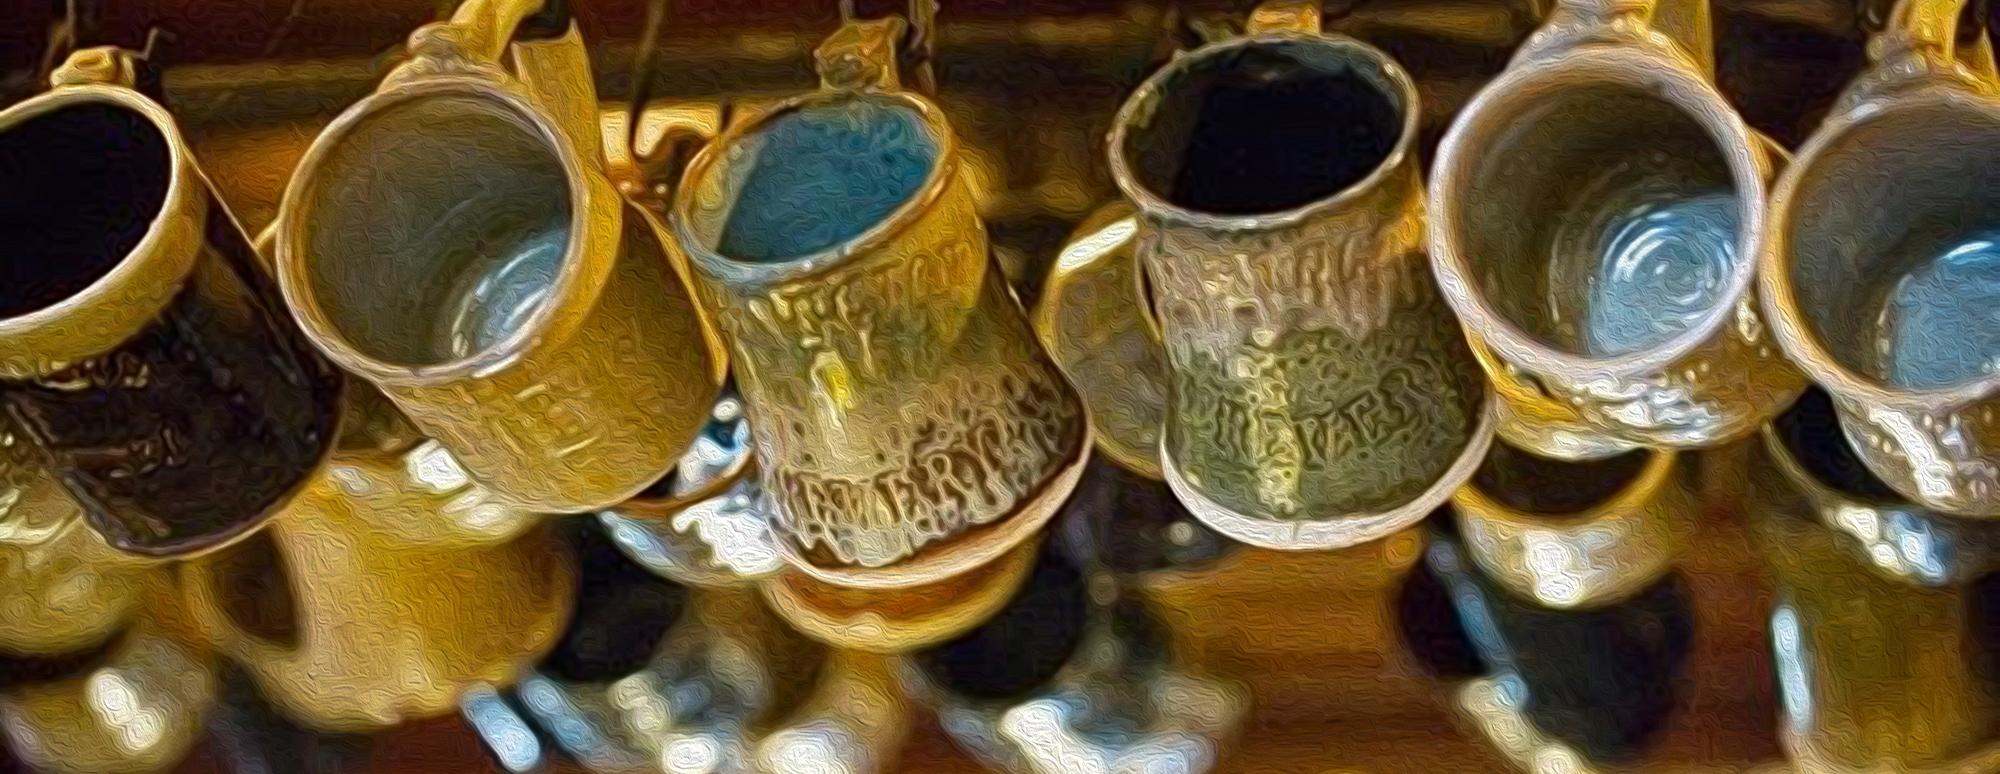 mugs.png